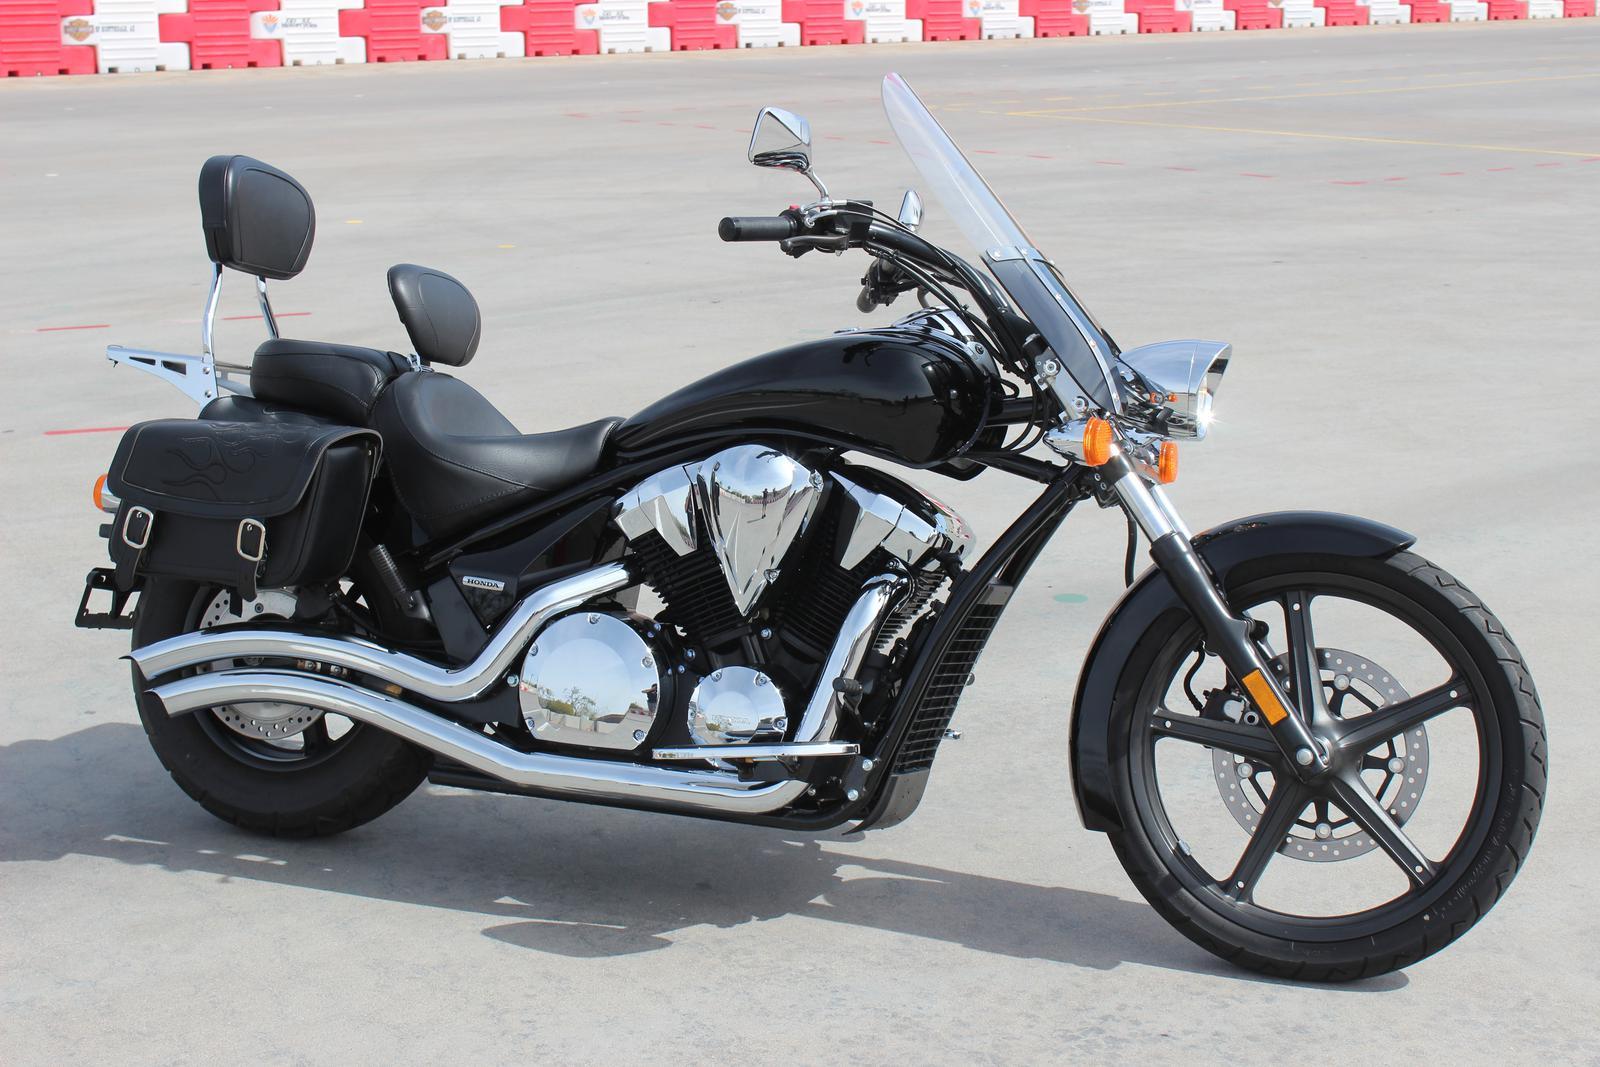 2013 Honda Sabre for sale in Scottsdale, AZ | GO AZ Motorcycles in ...